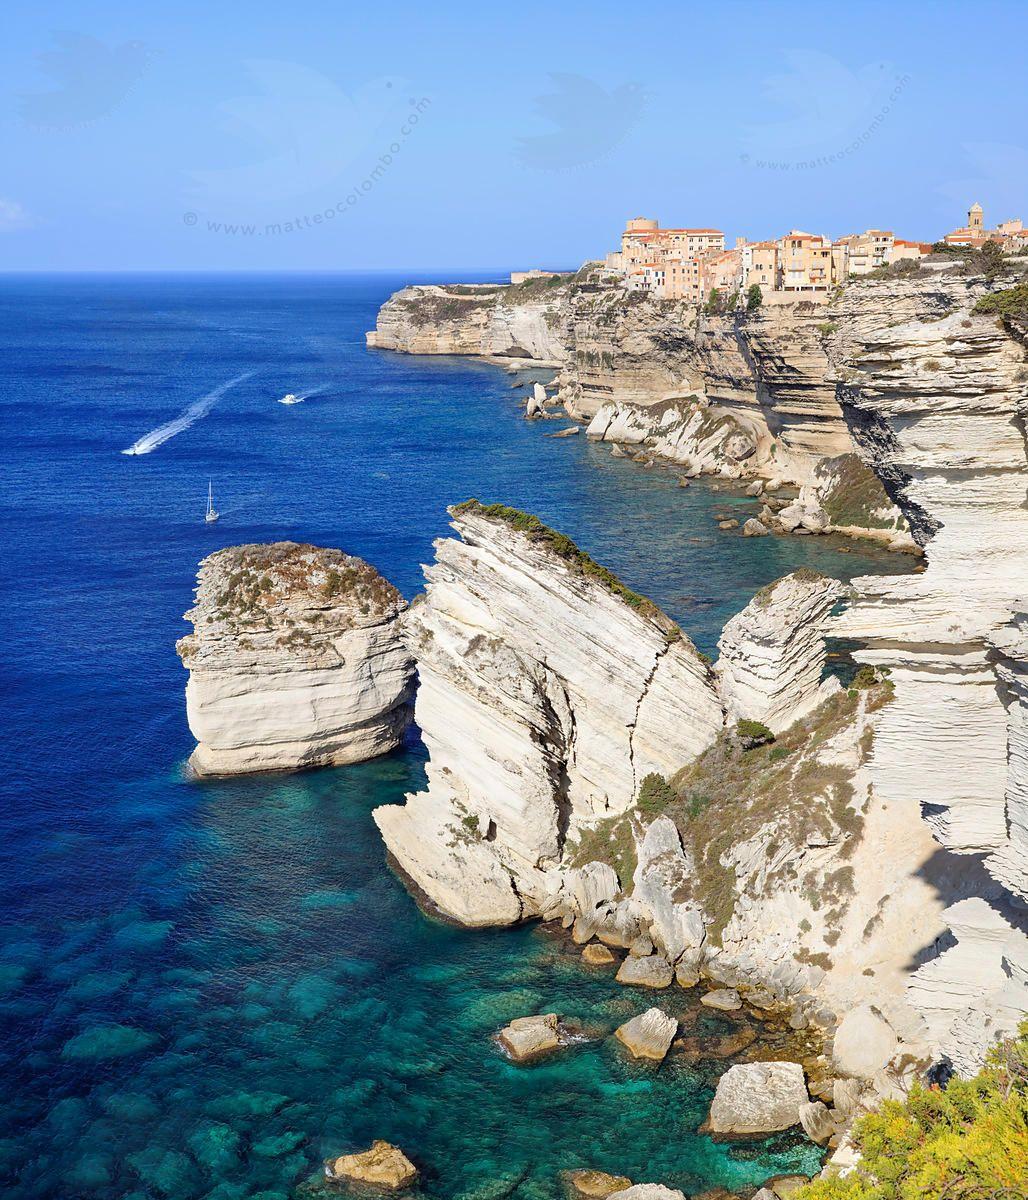 Bonifacio on the cliffs, Corsica, France By Matteo Colombo